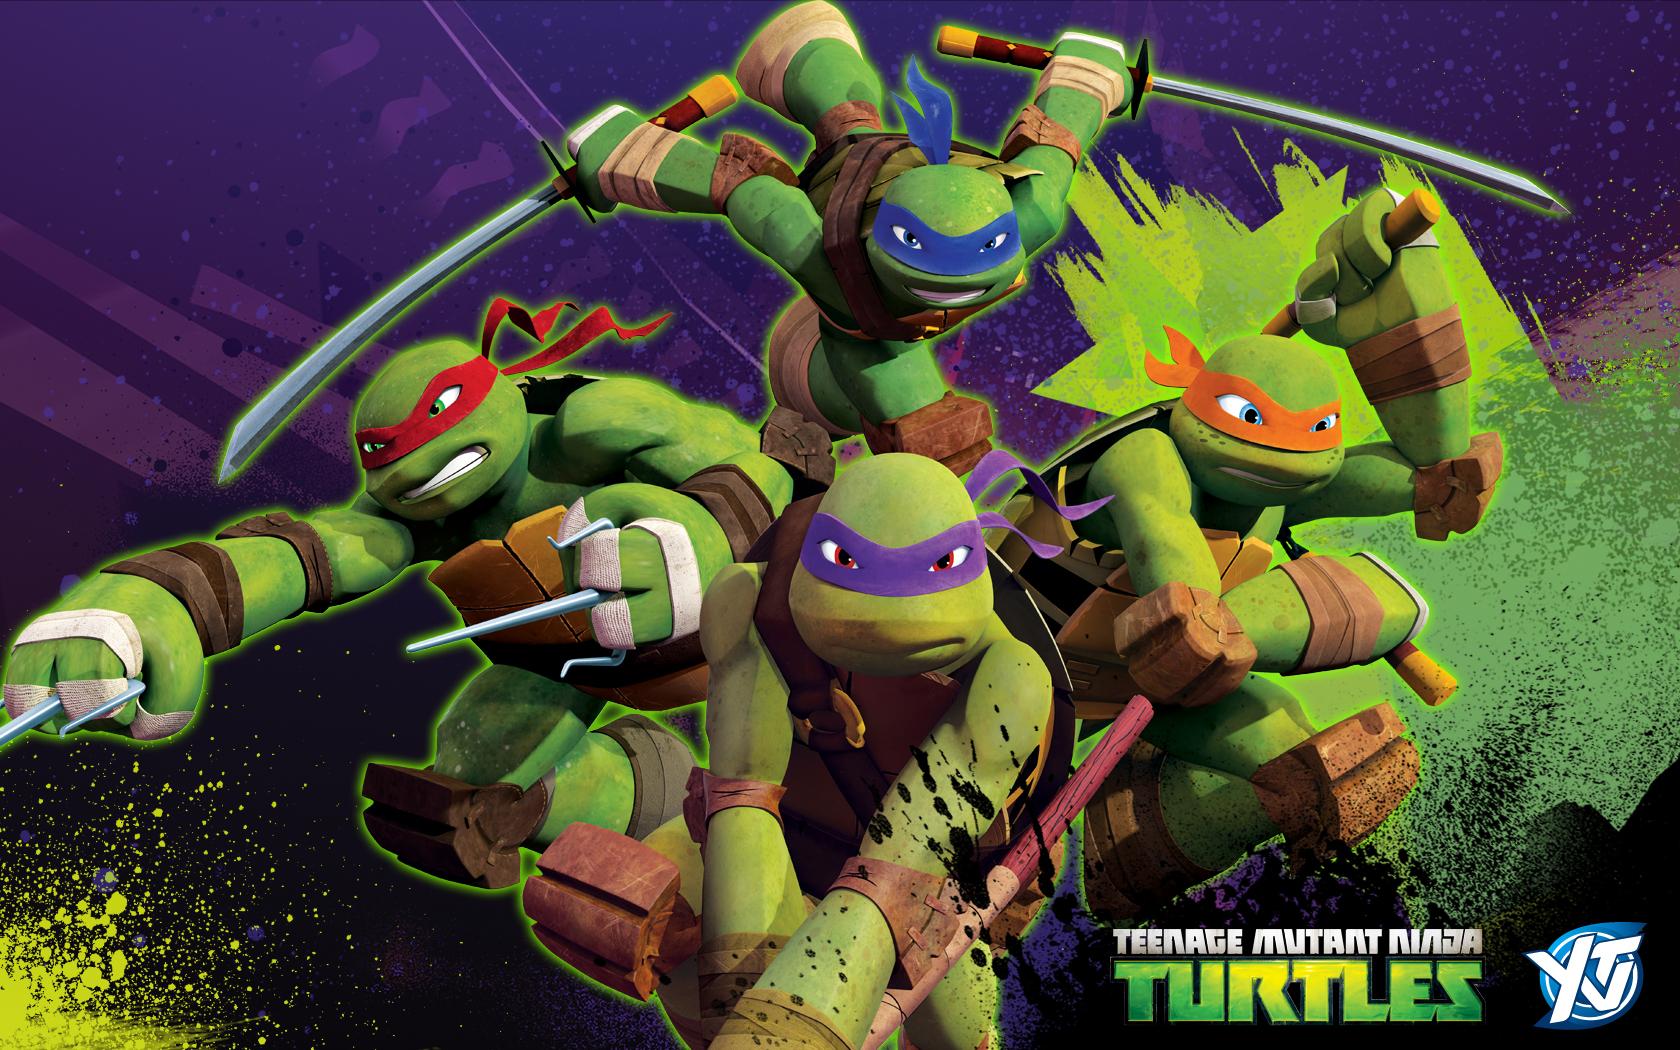 Cute Ninja Turtle Wallpaper Ninja Turtles Wallpaper 1680x1050 48555